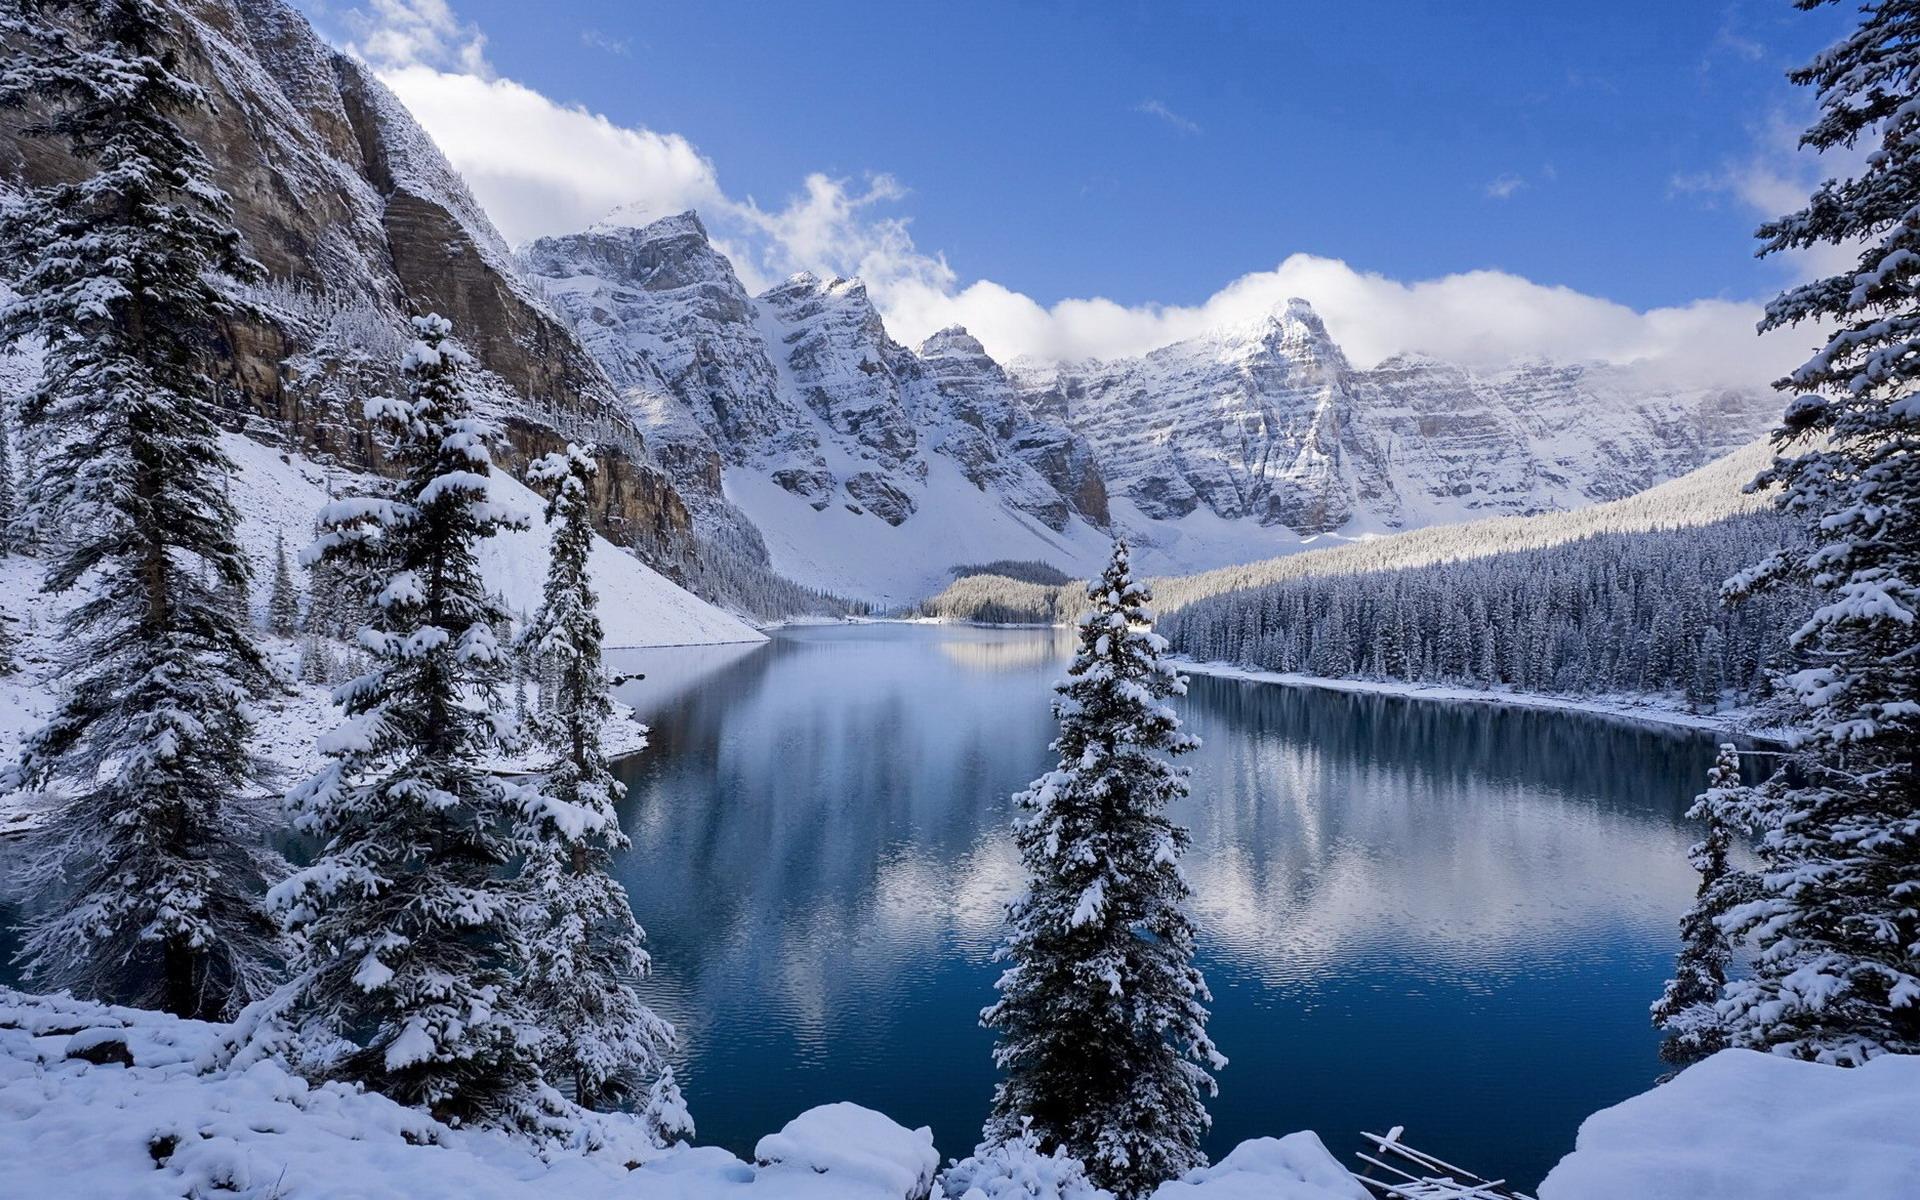 Природа зима обои рабочий стол